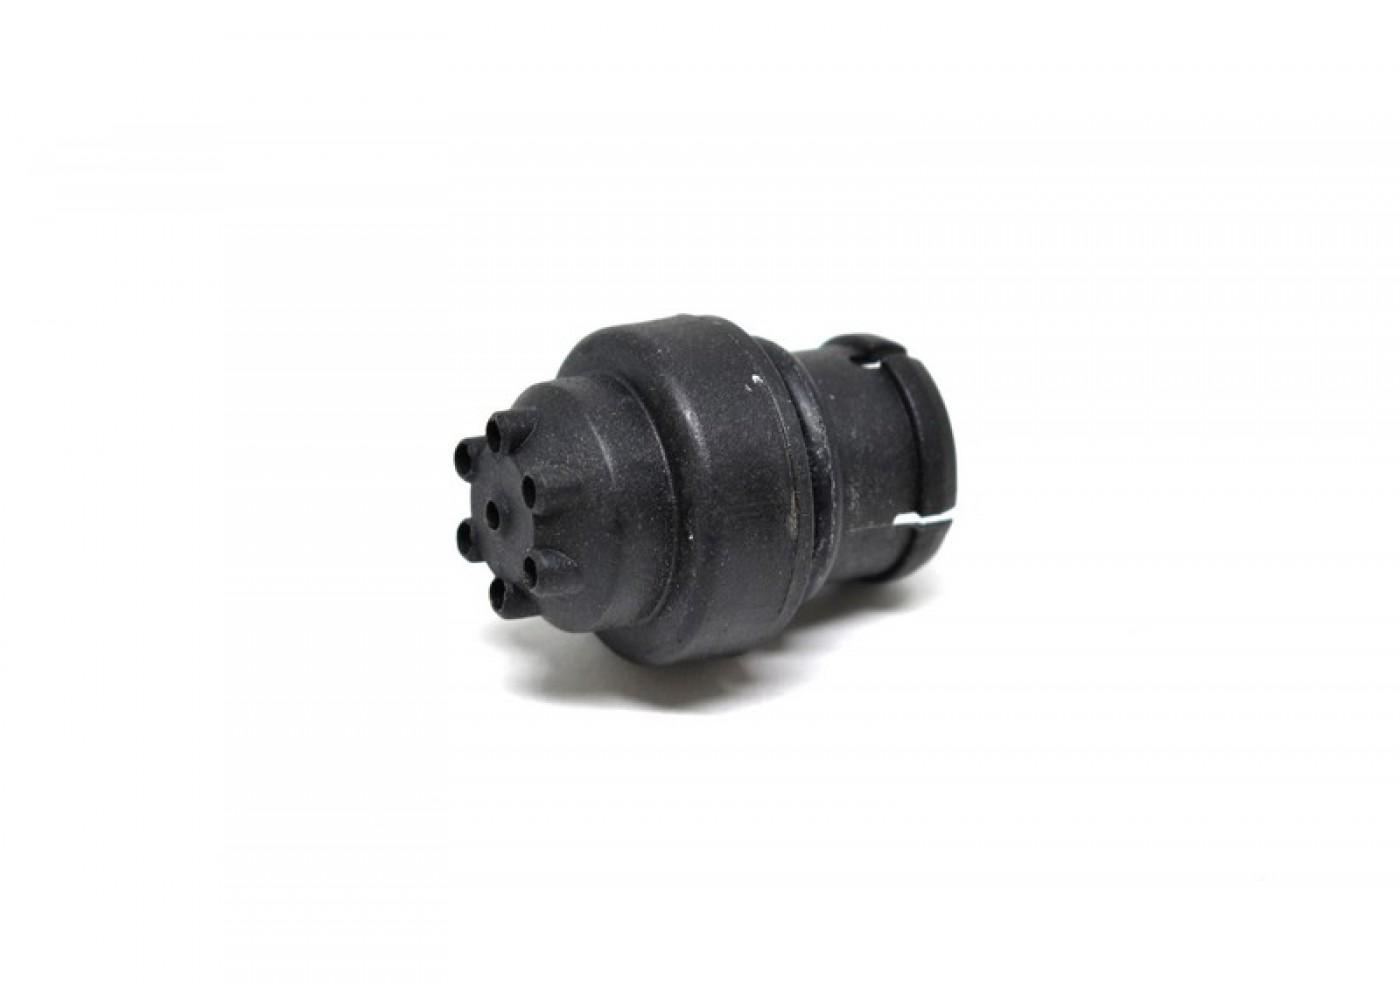 2f7d287cd68a5 Odvzdušňovací ventil palivovej nádrže Stihl MS361 MS362 MS260 BG85 - 0000  350 5800HS Parts